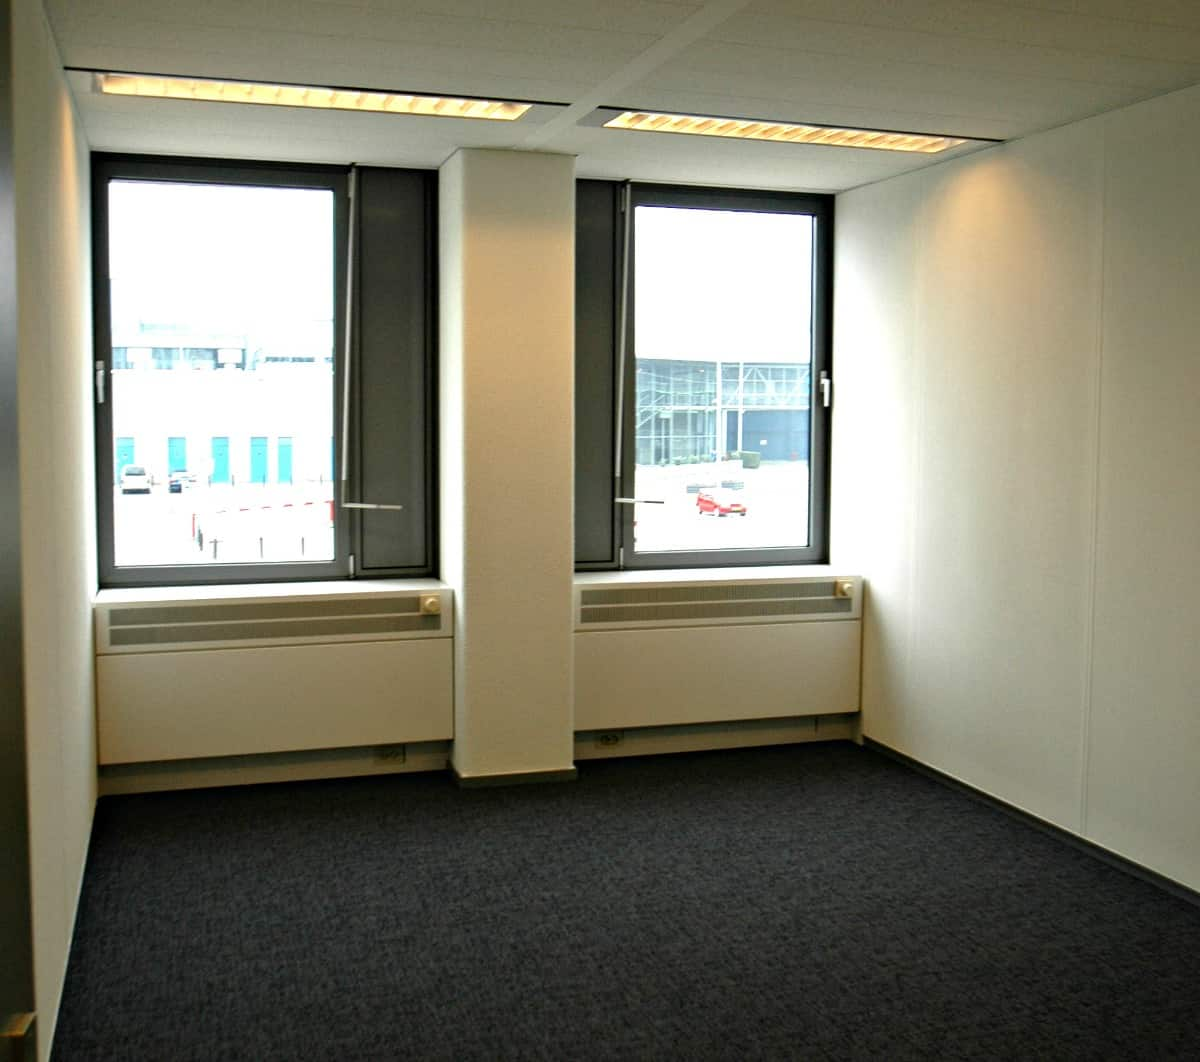 flexibele kantoorruimte werkplek maastricht huren